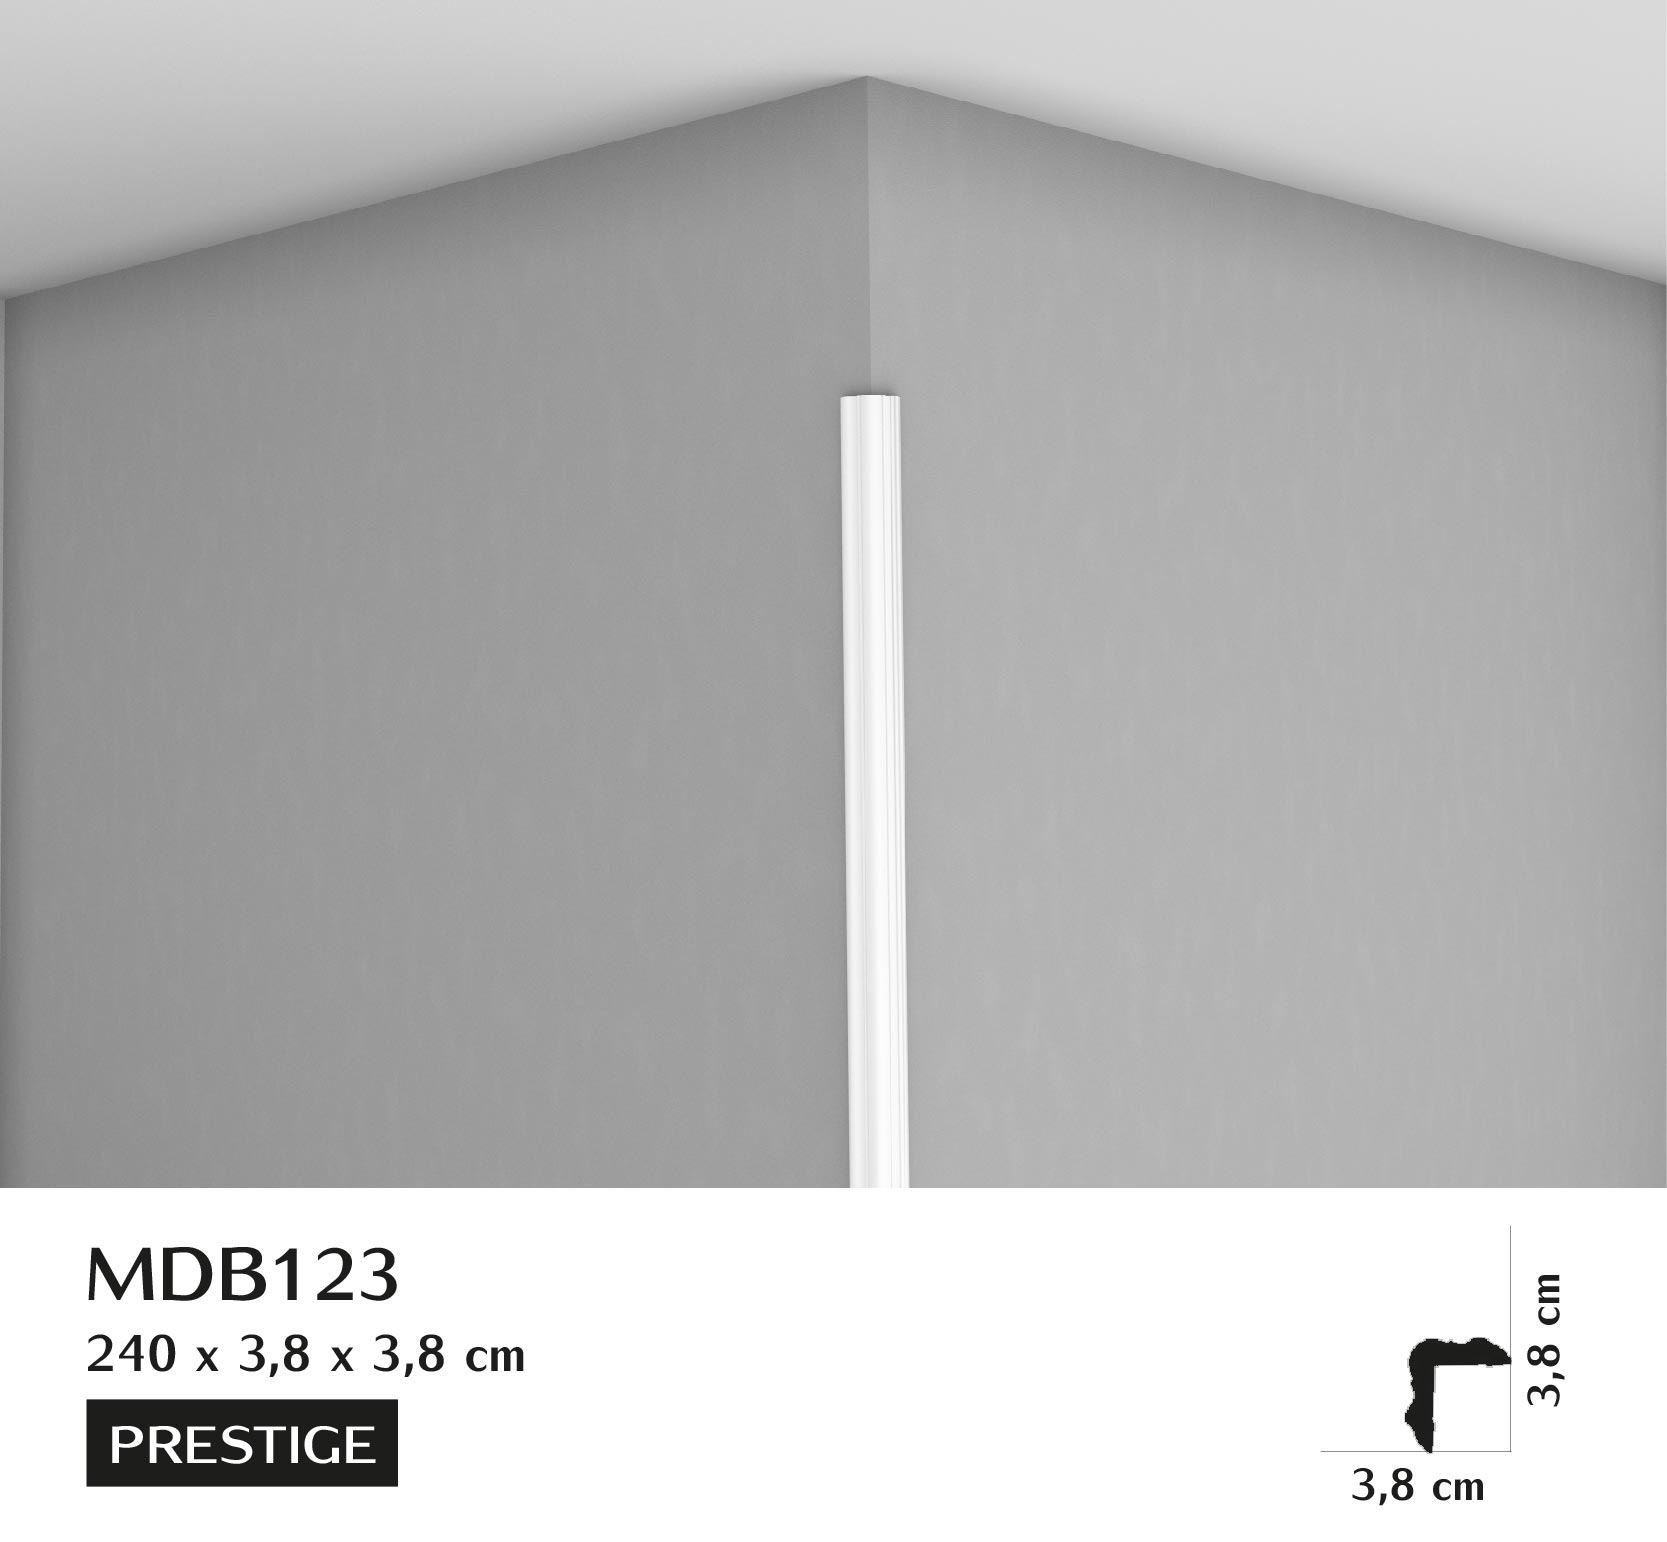 Mdb123